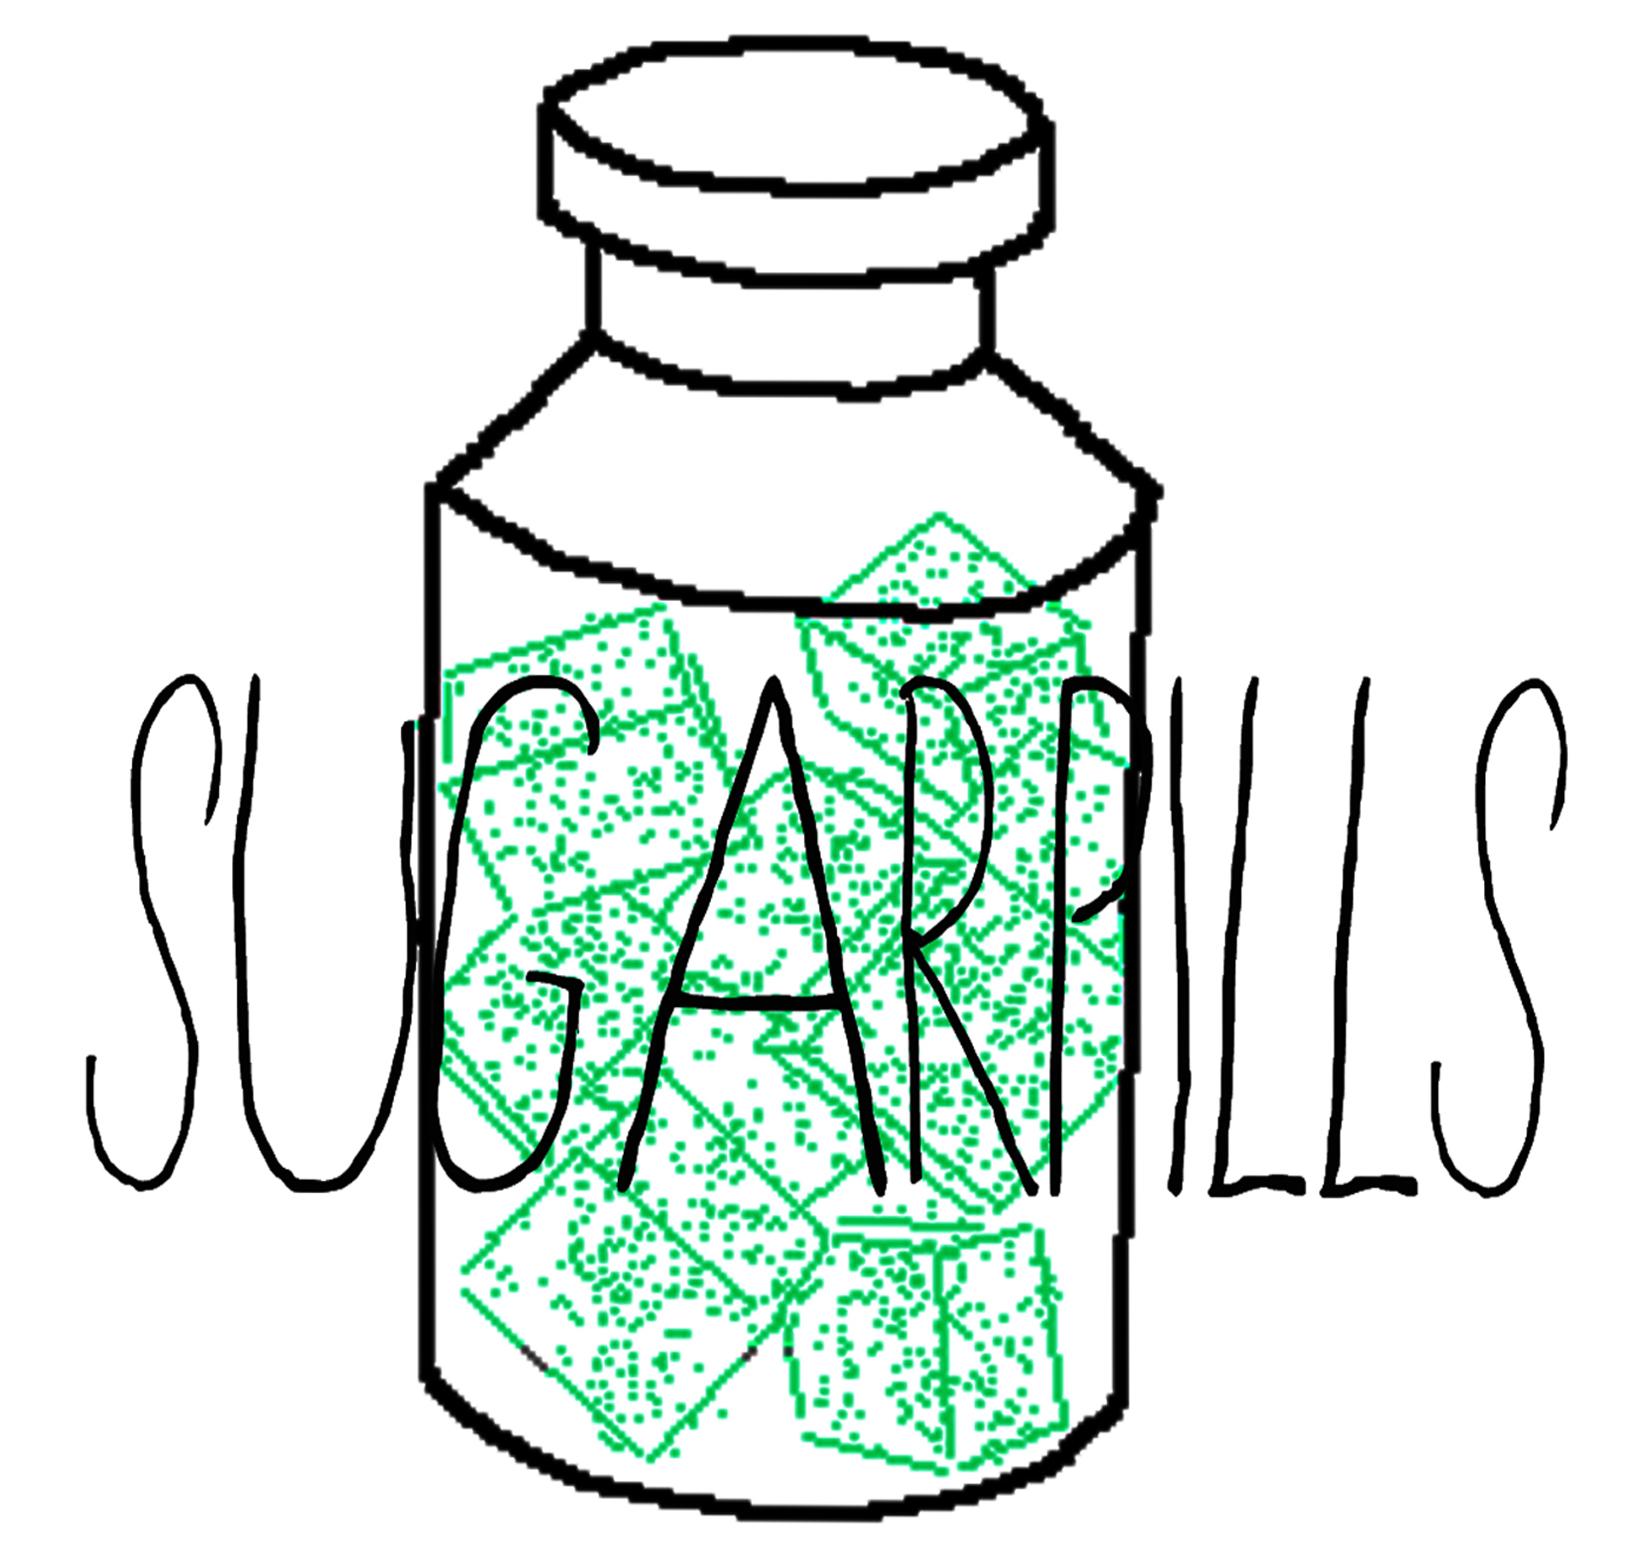 Sugarpills